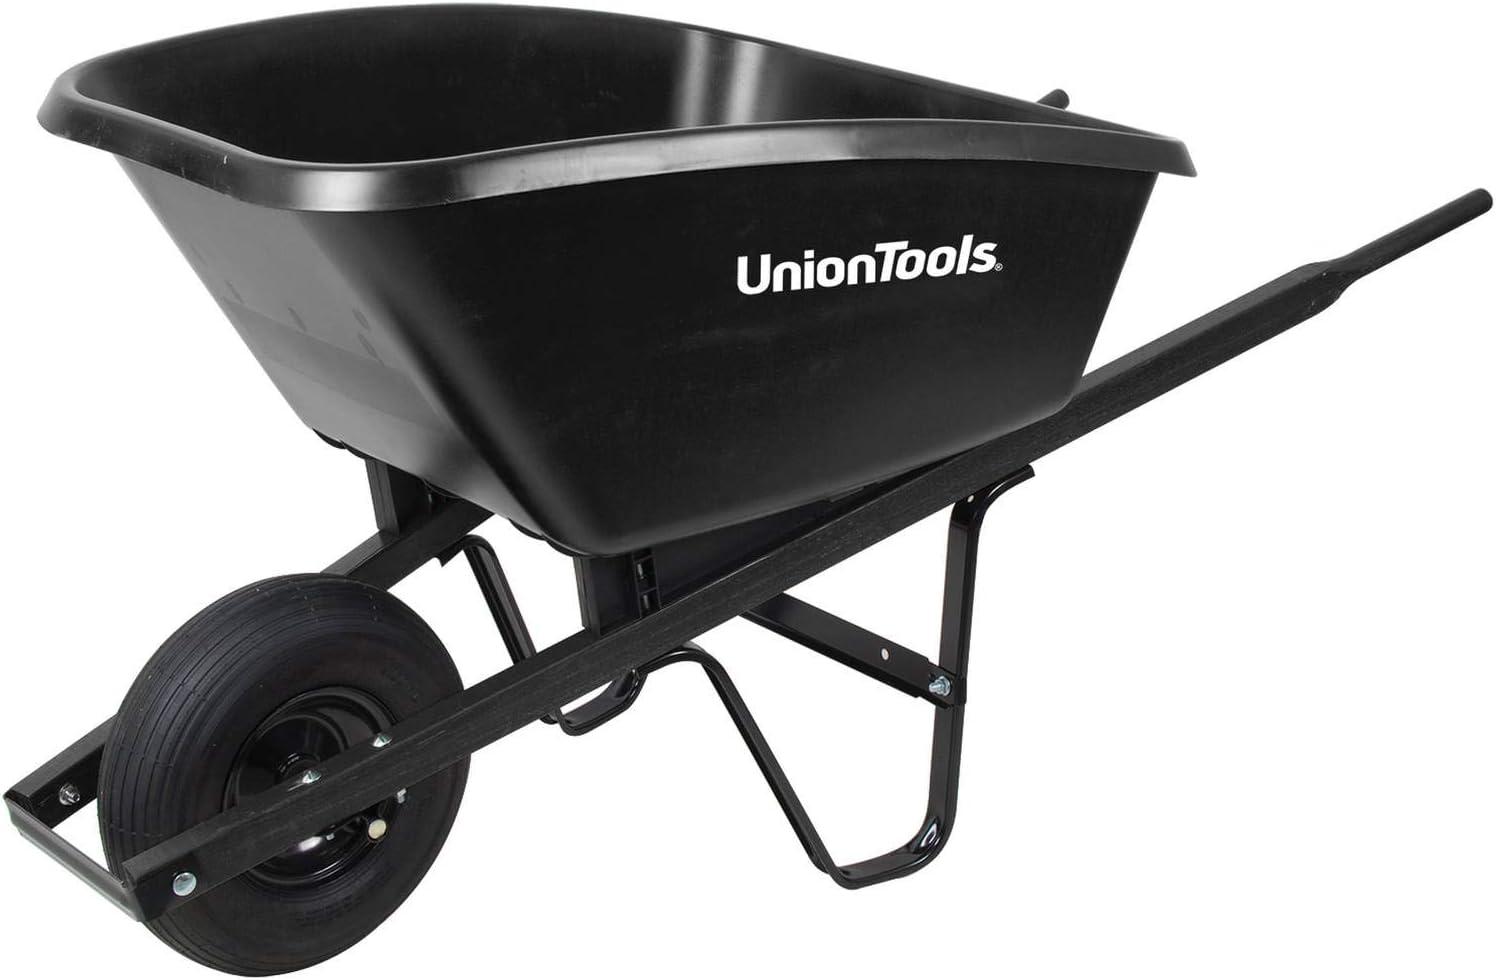 【UnionTool】一輪車 5cf ポリーバロウ SP5 True Temper アメリカ 140L ガーデニング